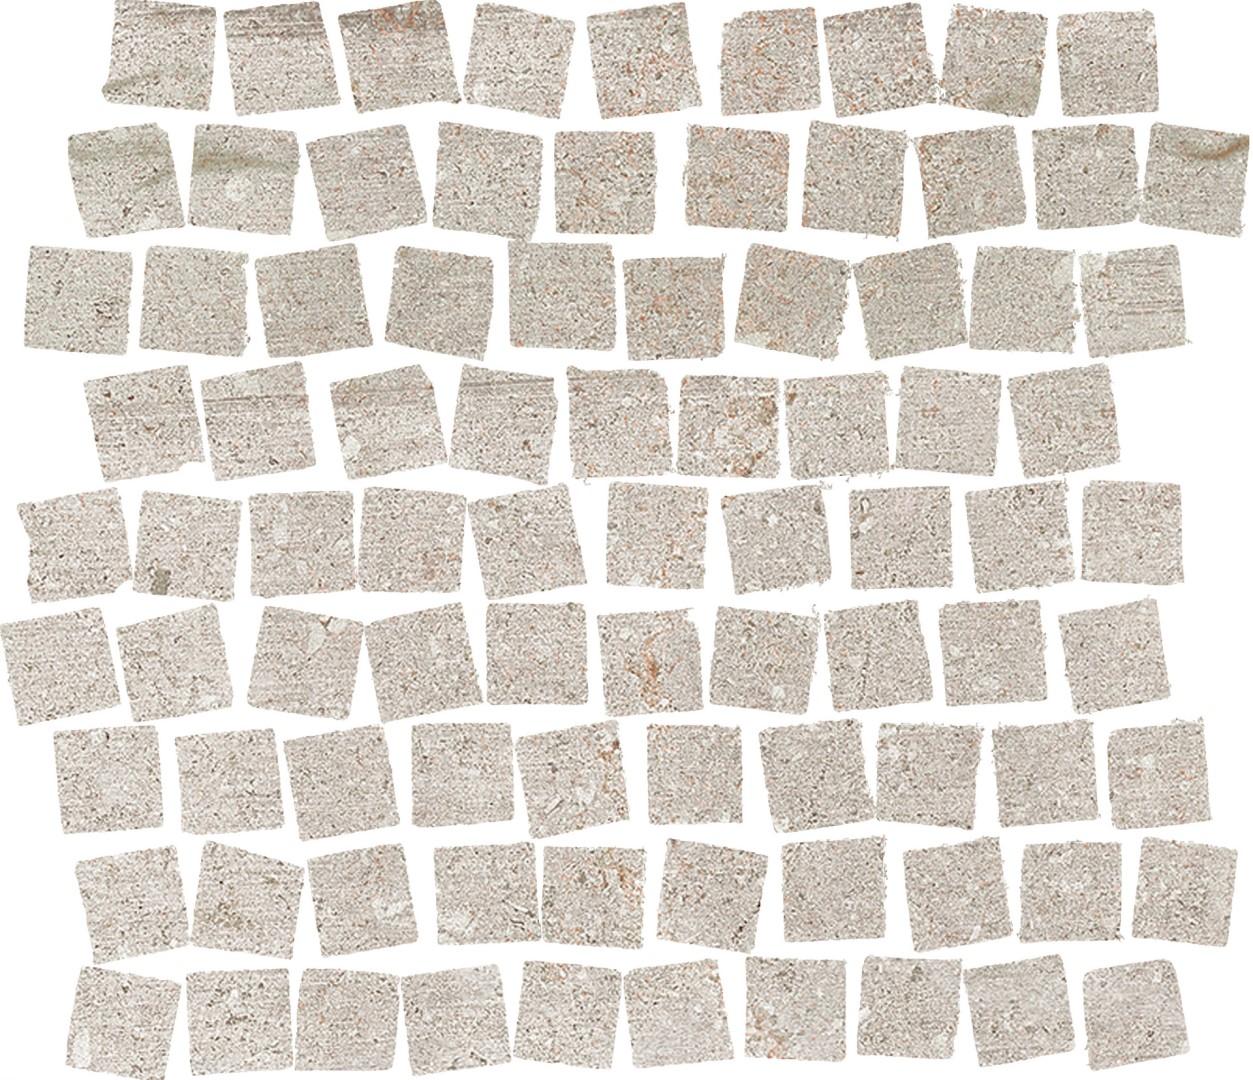 Obklad Mosaico Grey 32,5x32,5 cm, mat